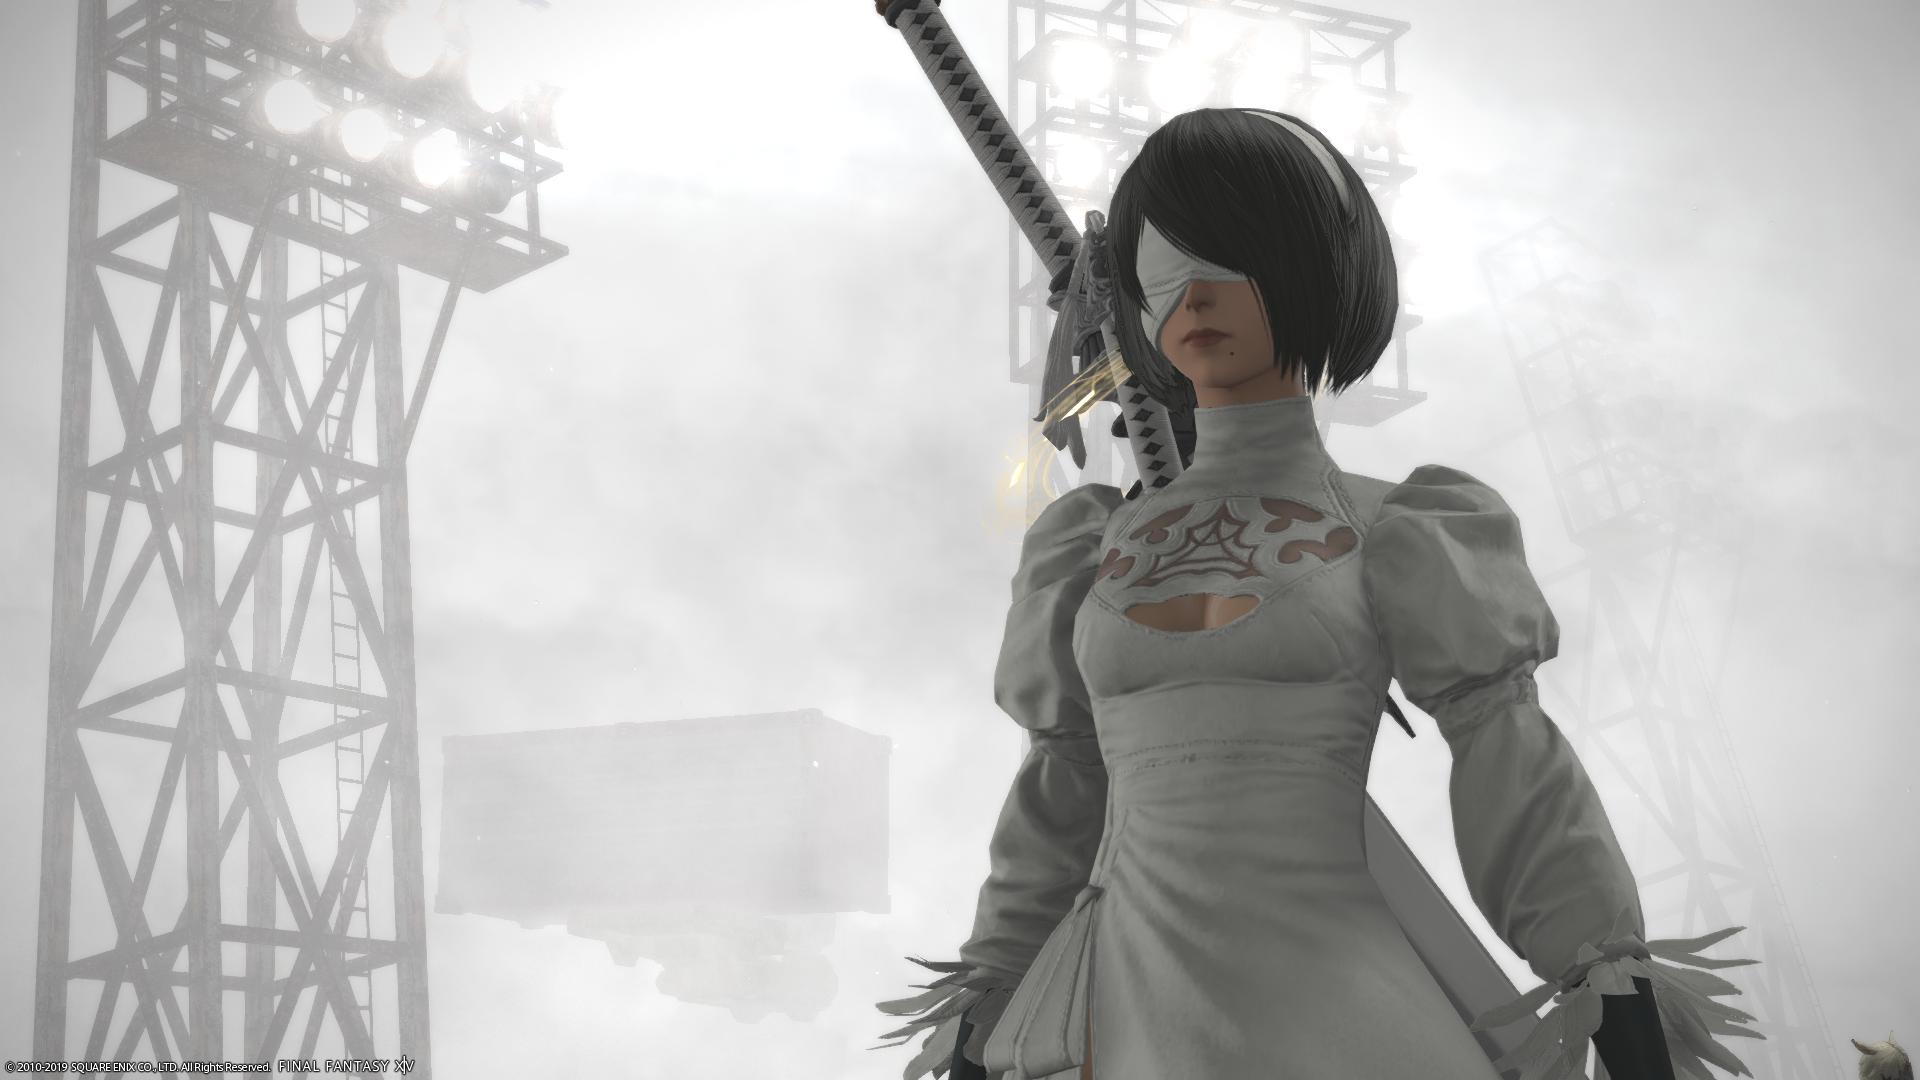 Final Fantasy XIV's Nier Automata Raid Is Spectacular